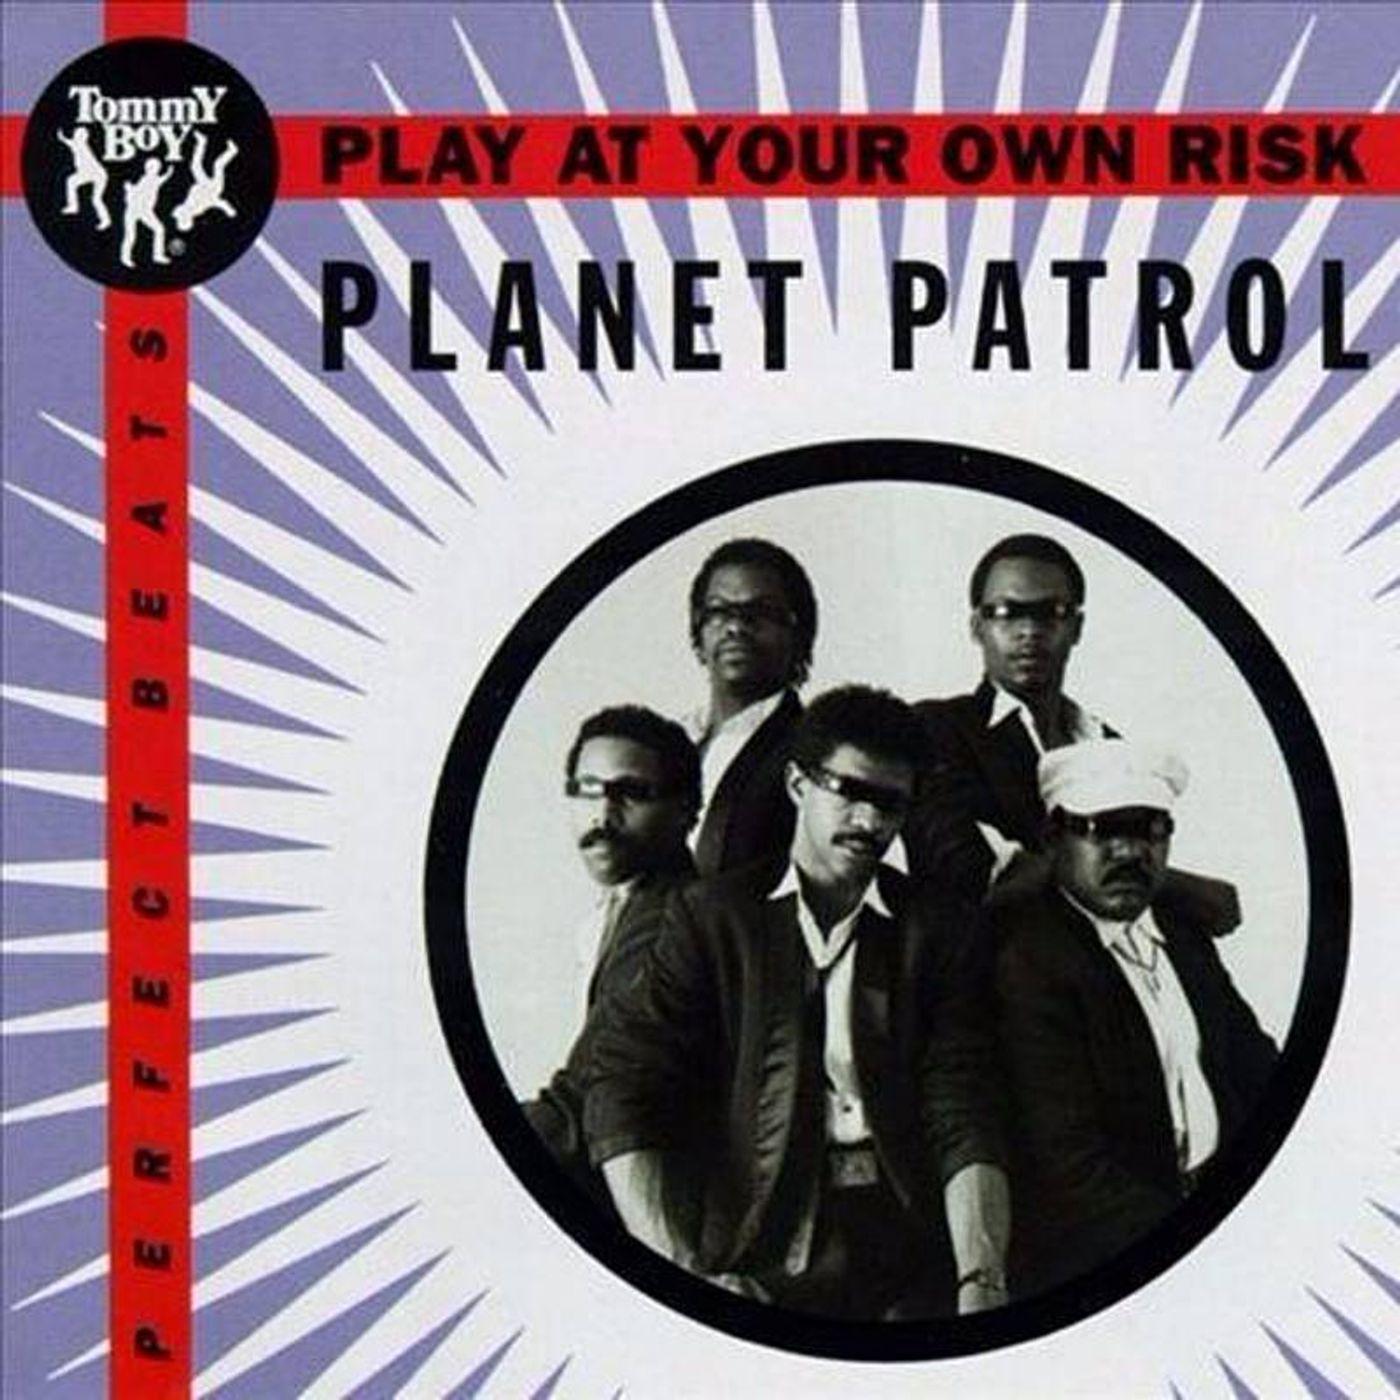 Planet Patrol on BTS